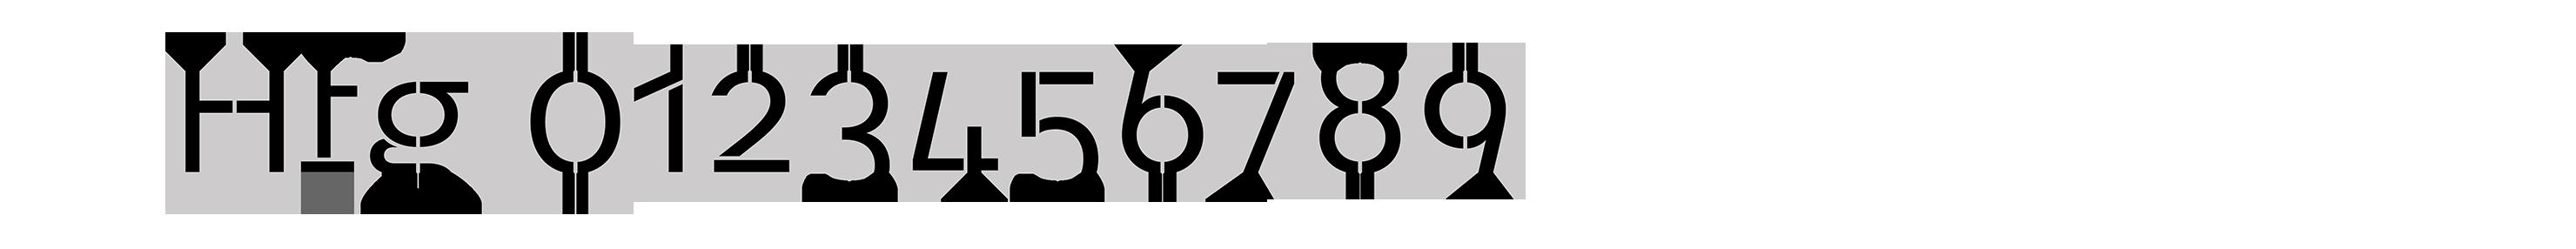 Typeface-Heimat-Stencil-F10-Atlas-Font-Foundry